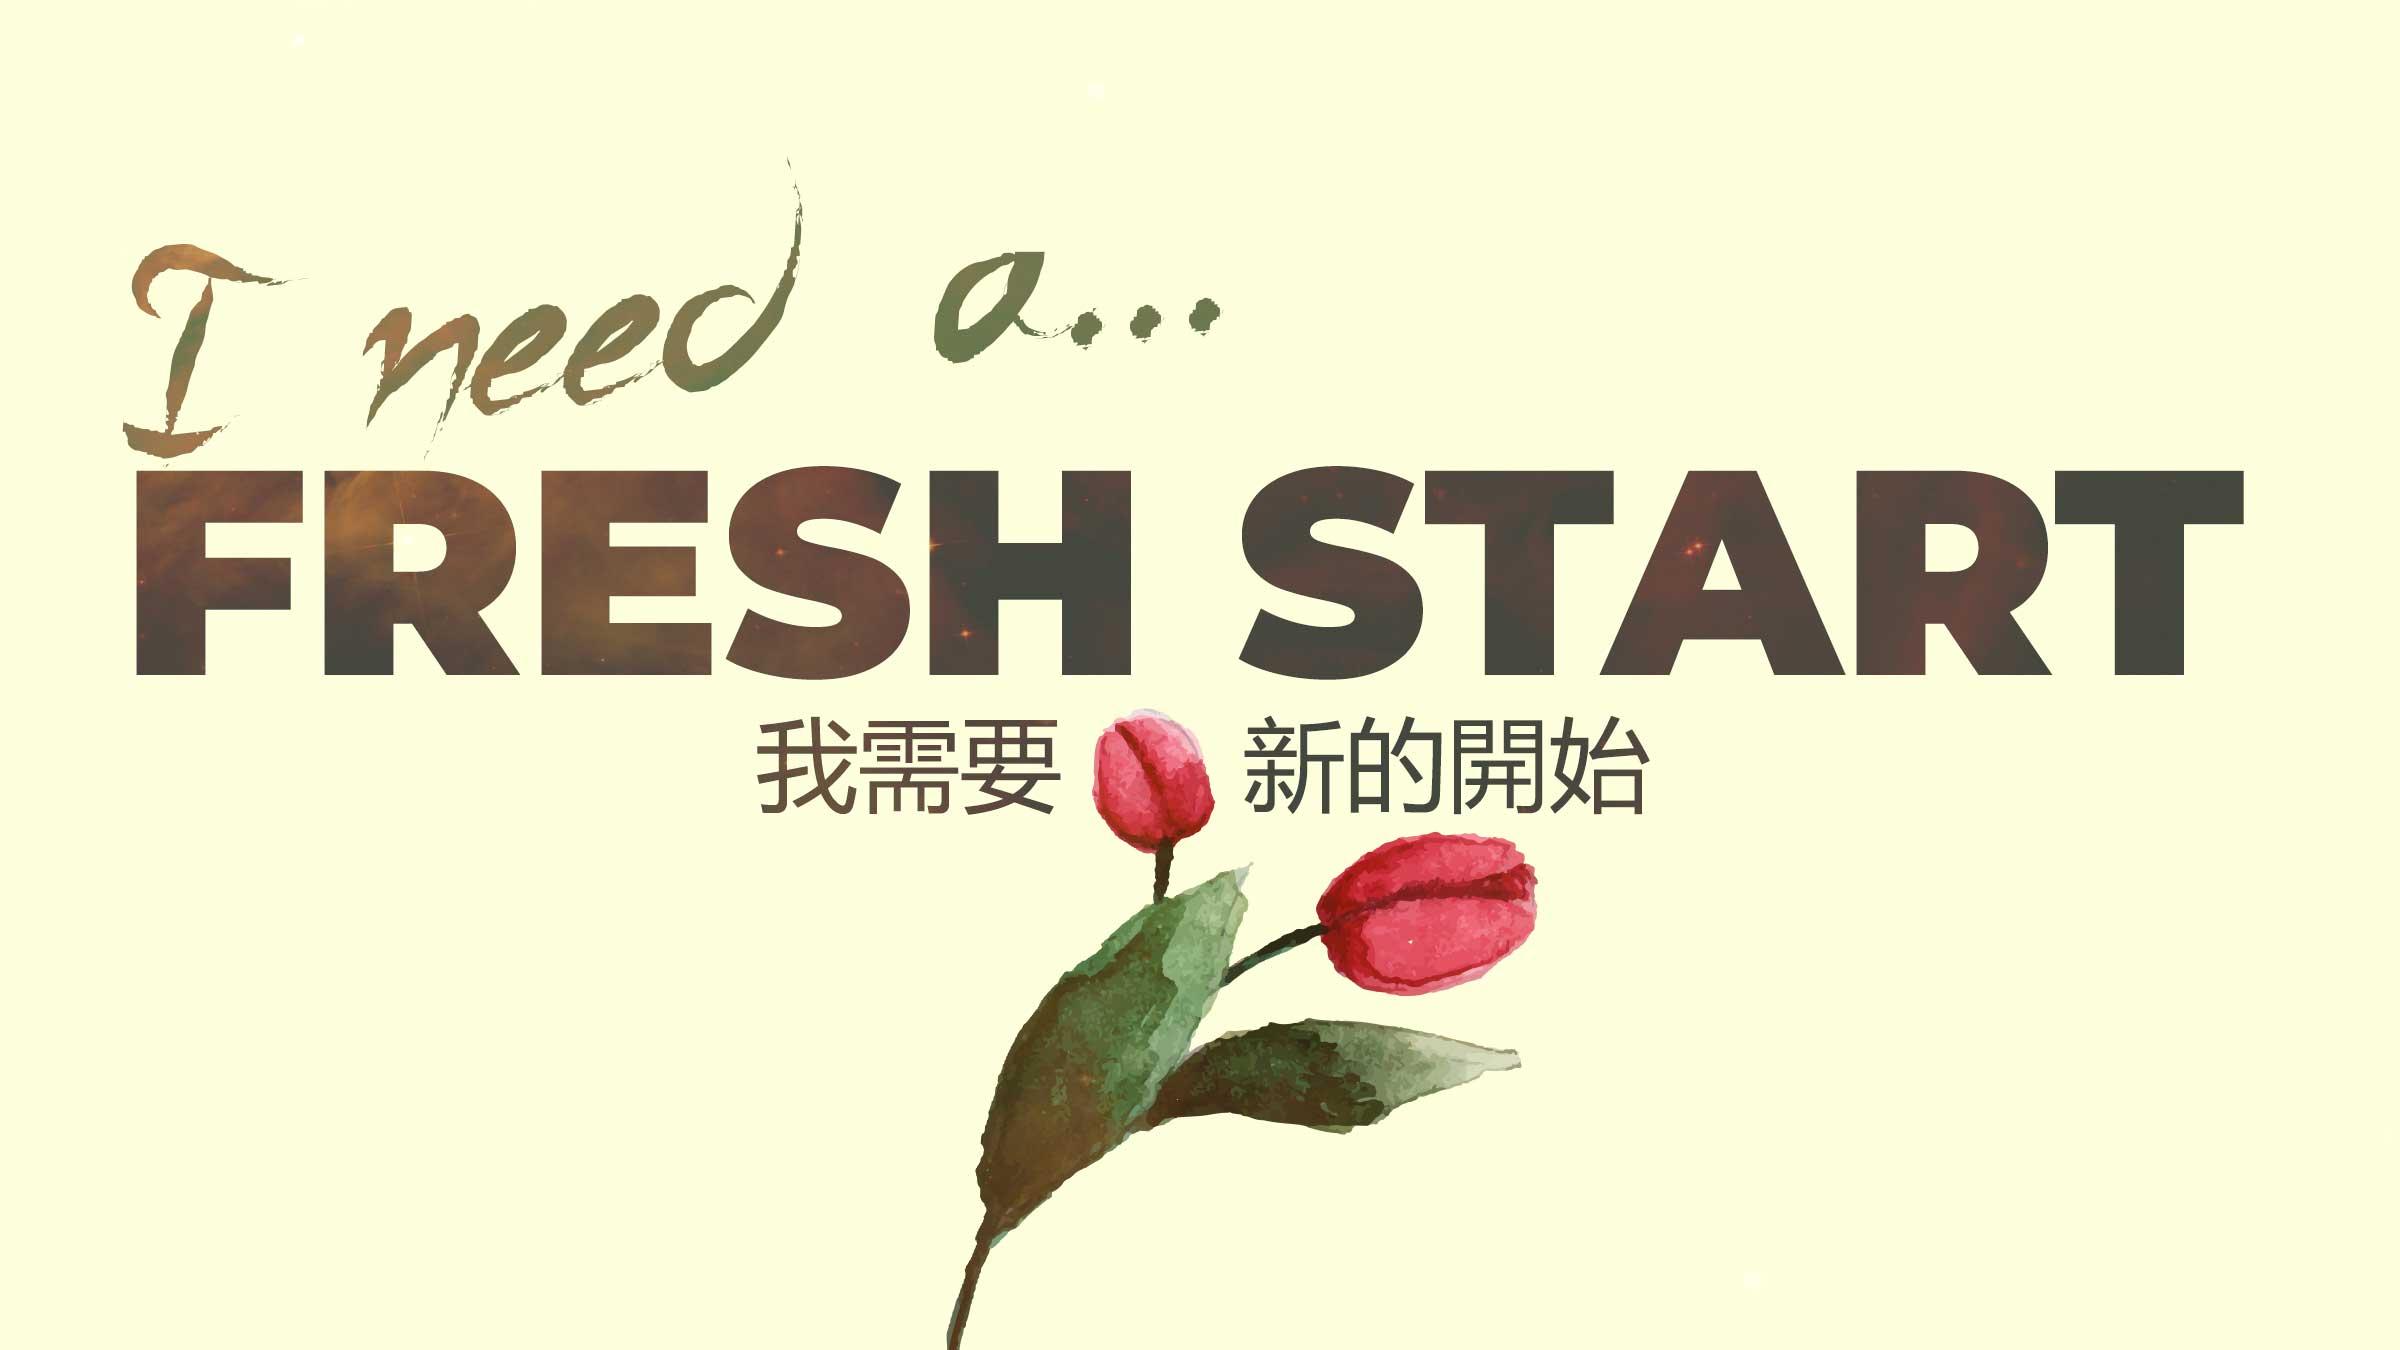 I-Need-a-Fresh-Start--Title